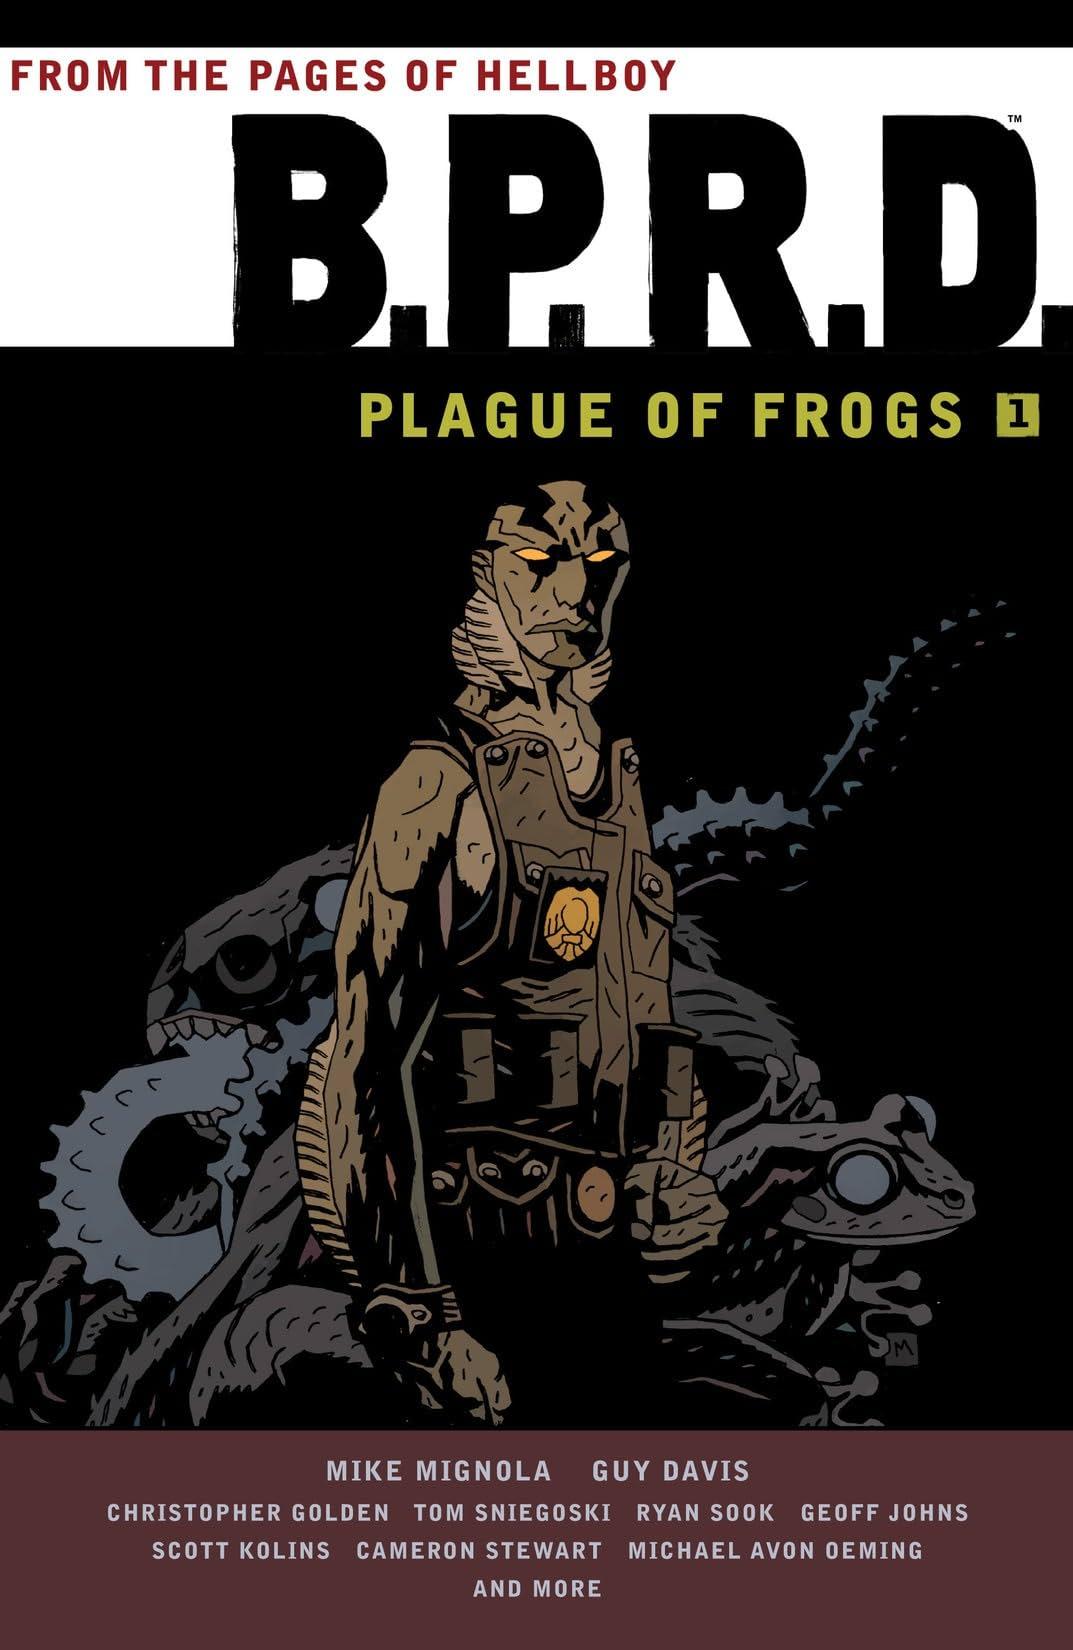 B.P.R.D.: Plague of Frogs Vol. 1